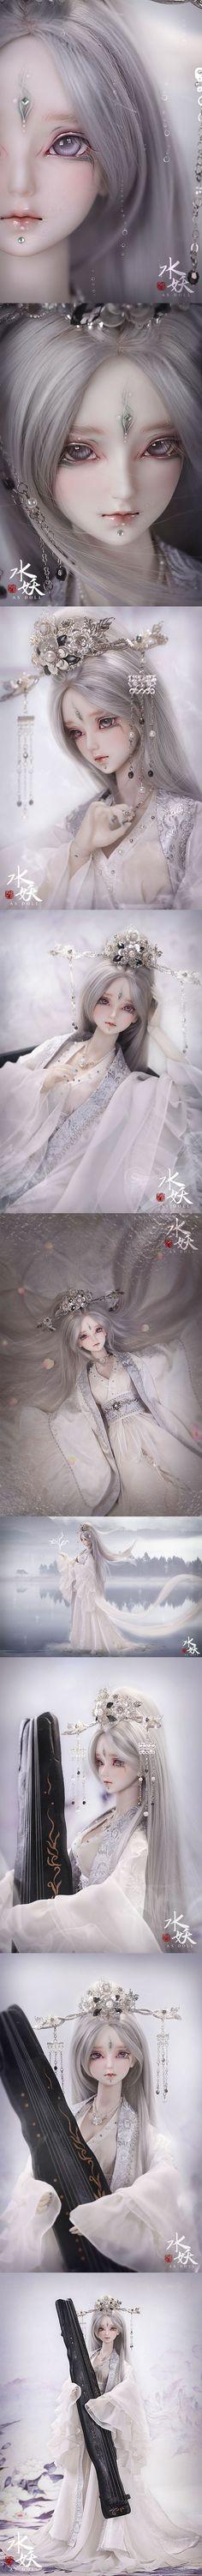 ((AS Agency)BJD Xi Shi Ver2 Girl 62cm Ball-Jointed Doll_Size 62 ~ 72cm_Angell Studio_DOLL_Ball Jointed Dolls (BJD) company-Legenddoll